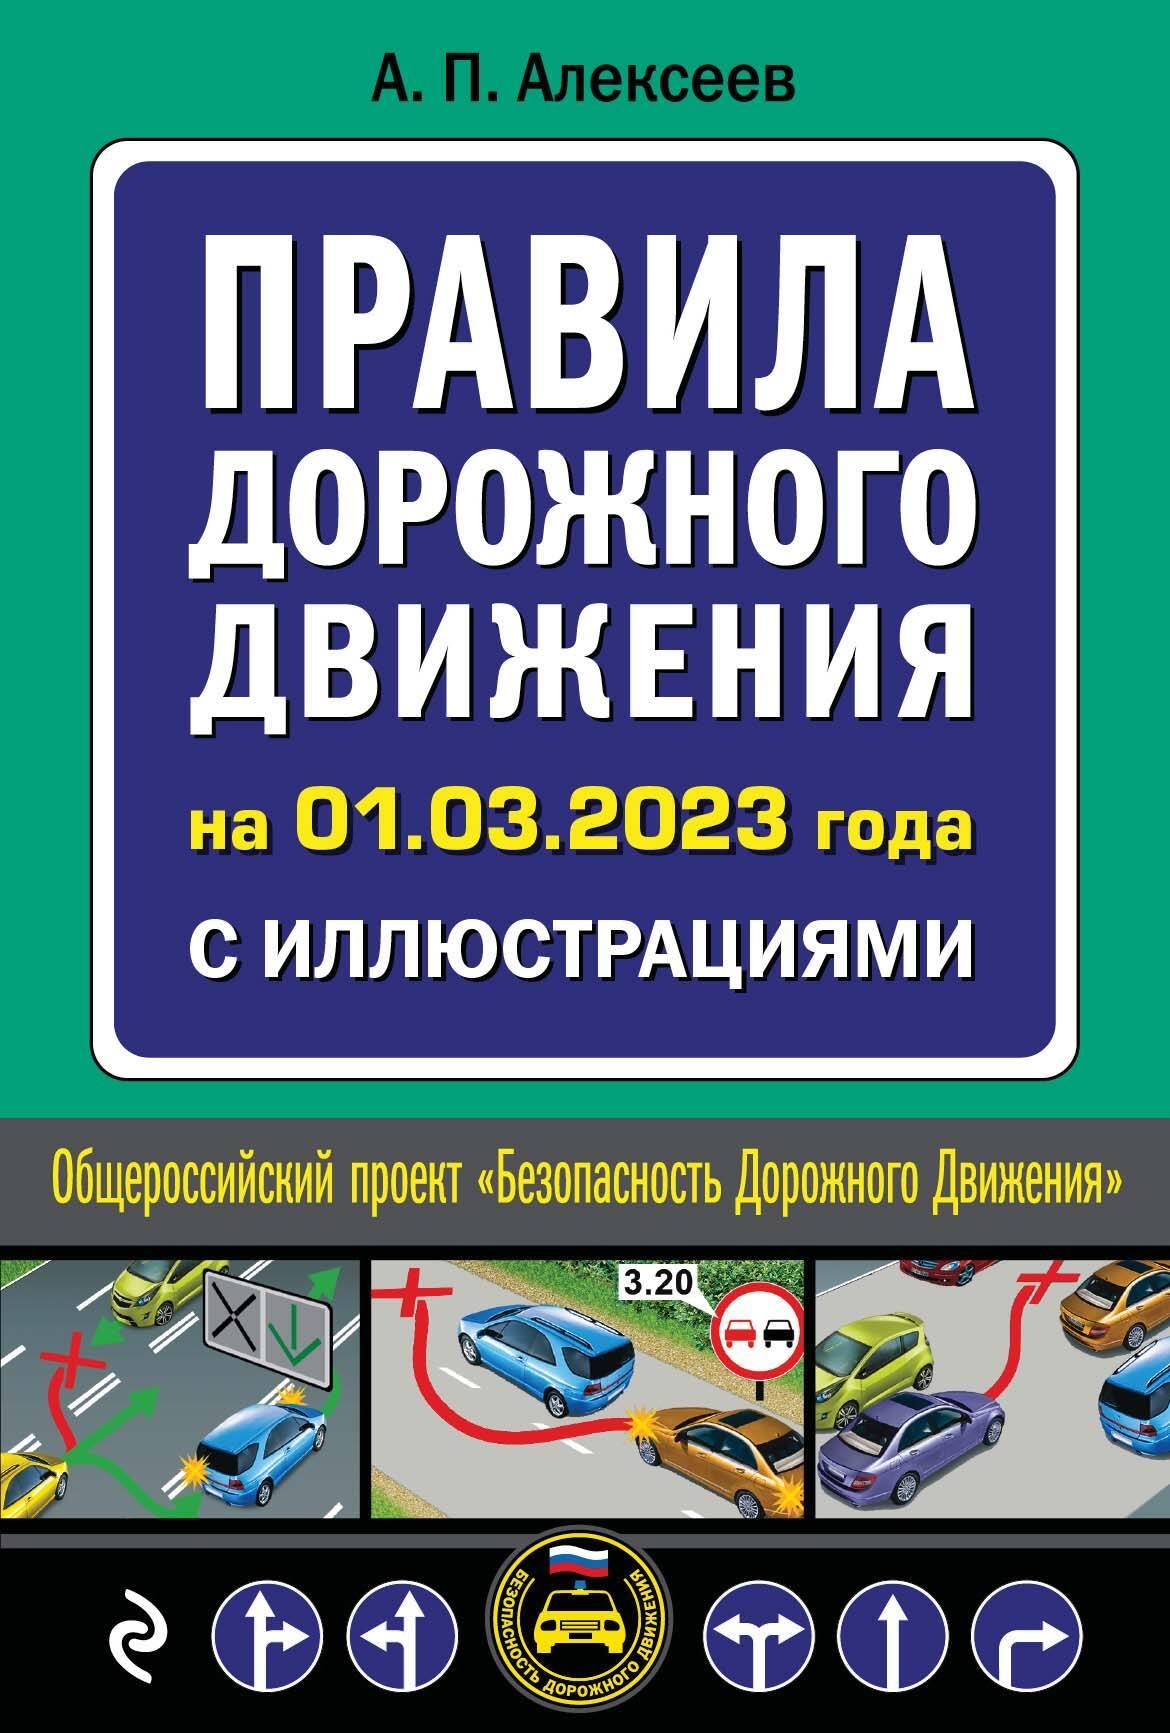 48523424-a-p-alekseev-pravila-dorozhnogo